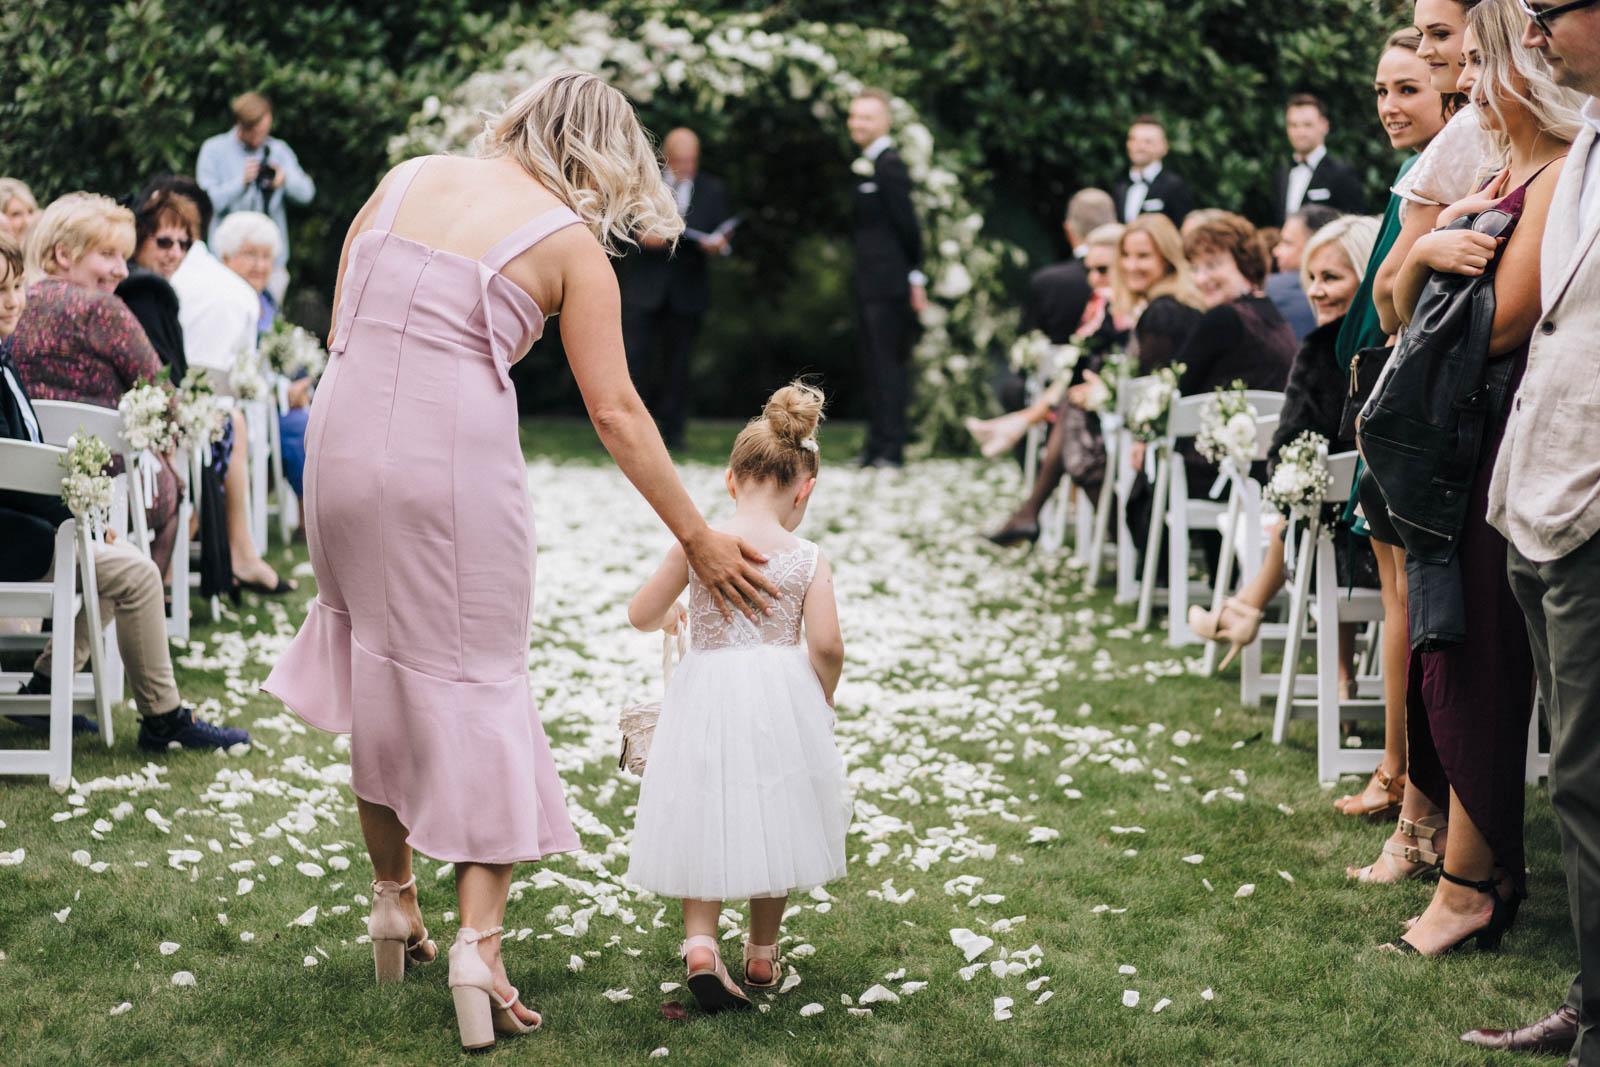 newfound-k-s-hilton-taupo-wedding-photographer-027